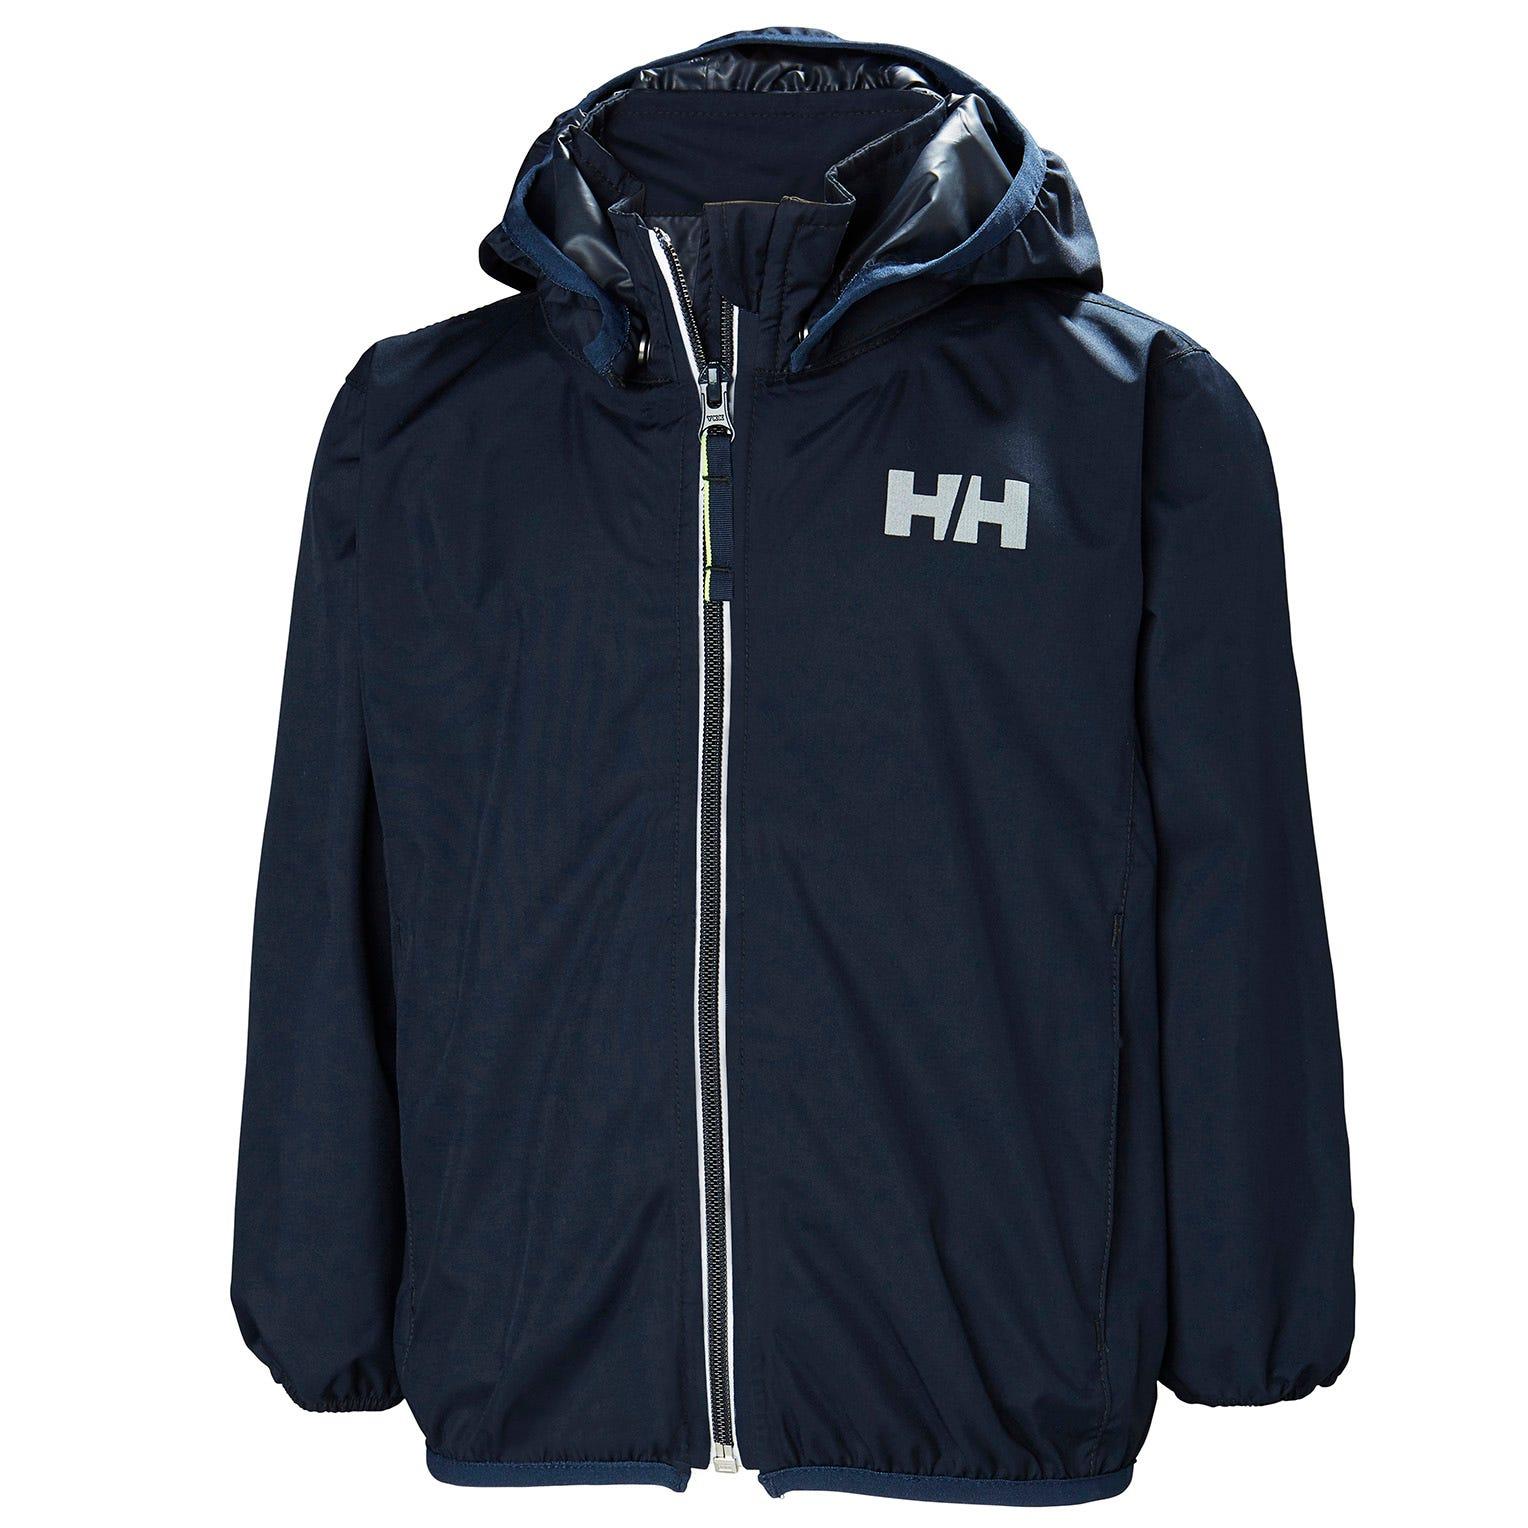 Helly Hansen Barn Helium Sammenleggbar Jakke marinen 134/9